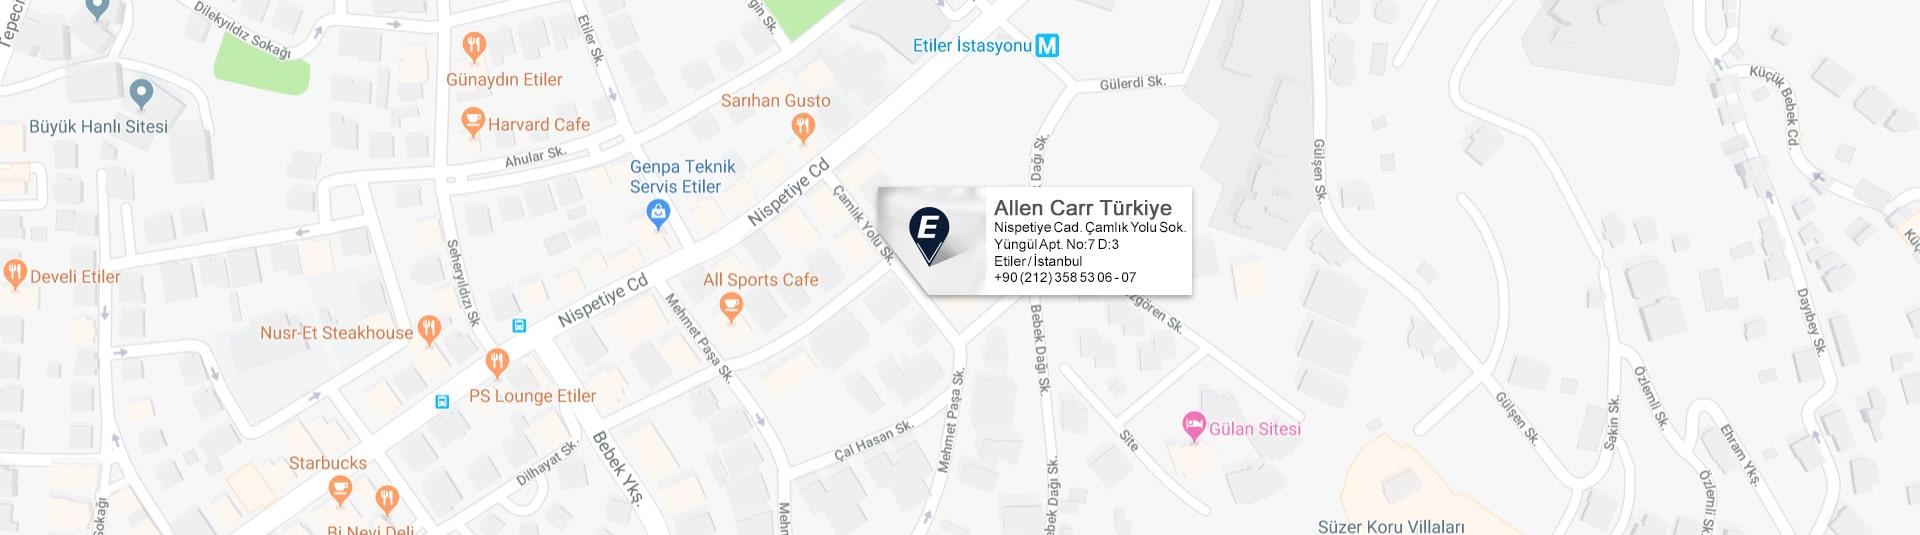 https://www.allencarr.com.tr/wp-content/uploads/2018/11/Allen-Carr-Turkiye-Google-Map-min.jpg